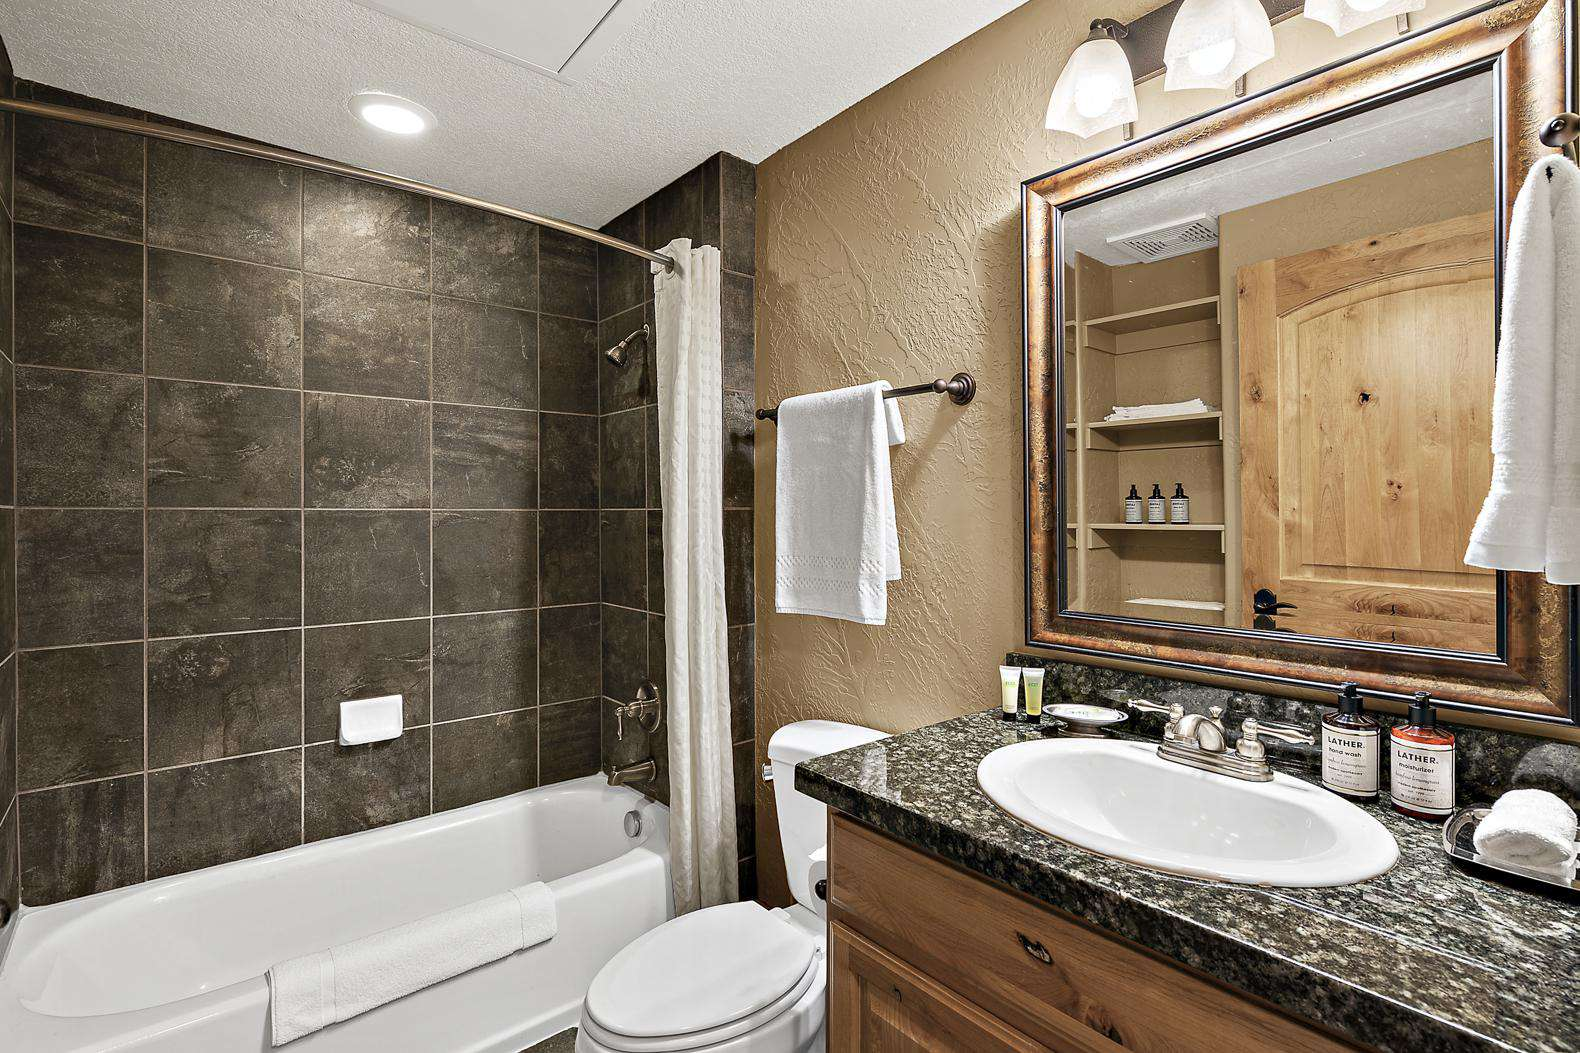 Guest Bathroom with bath/shower